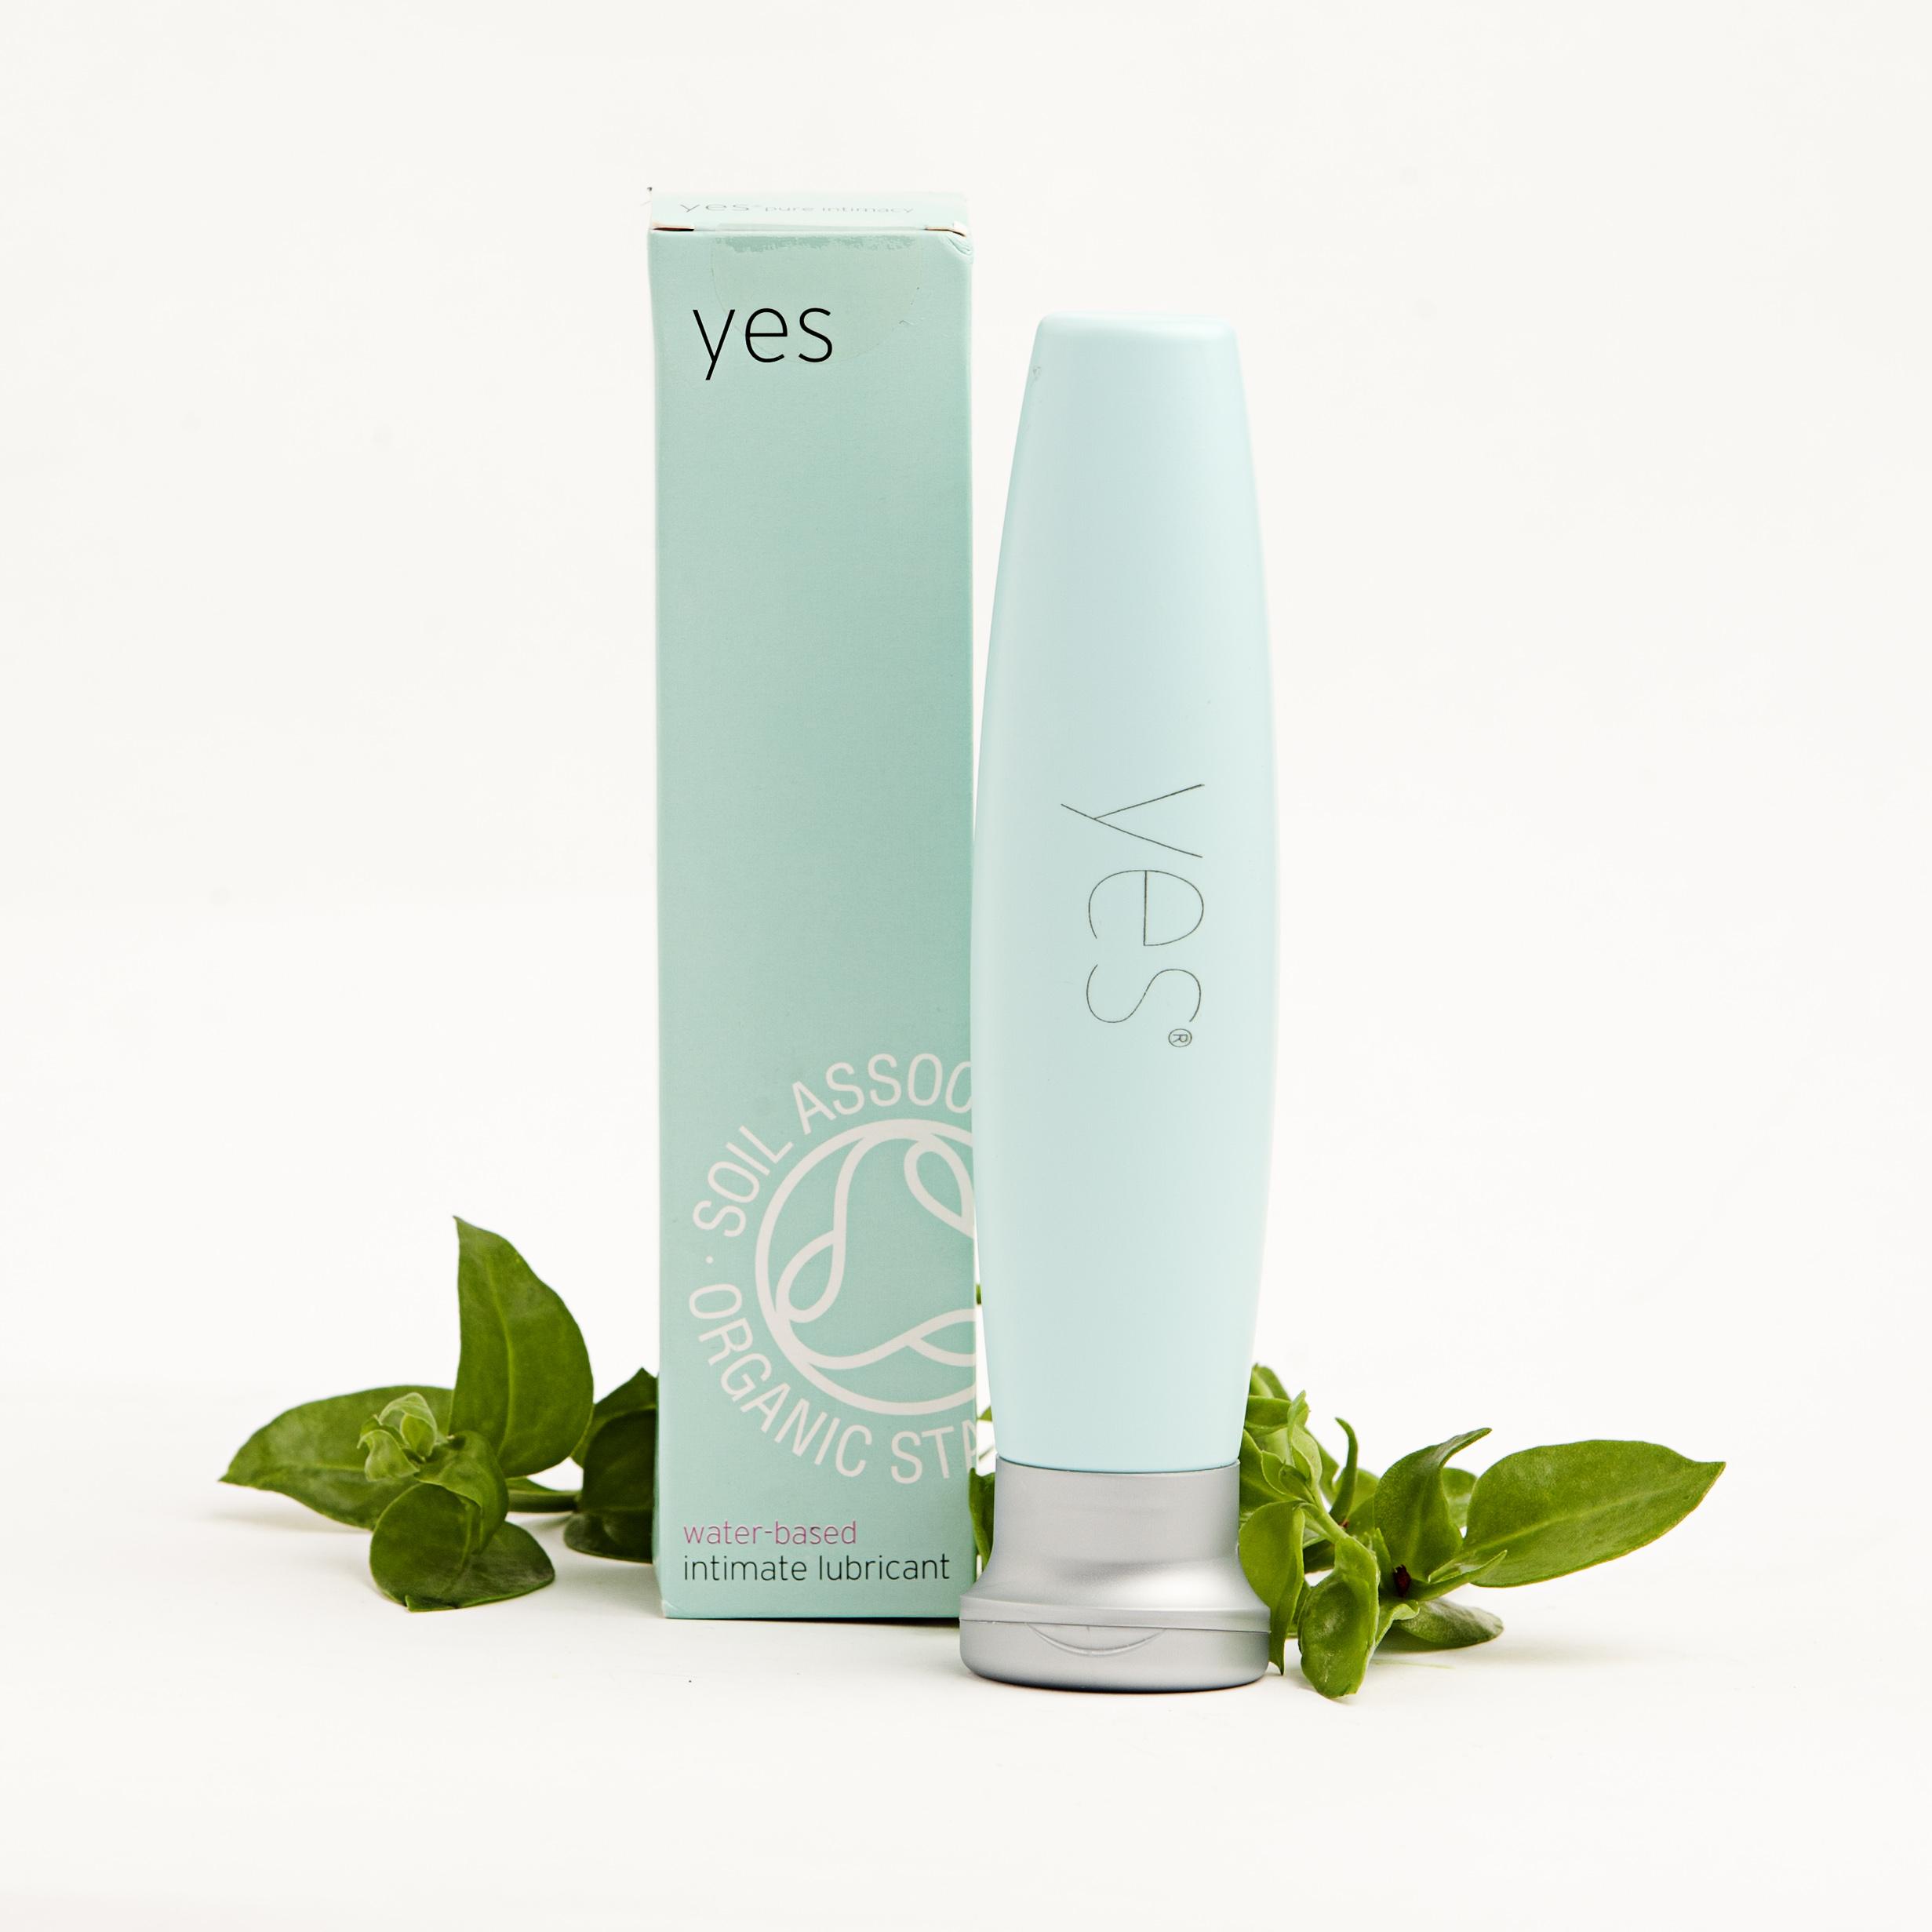 Lubricante Yes 75 ml, ecológico y vegano